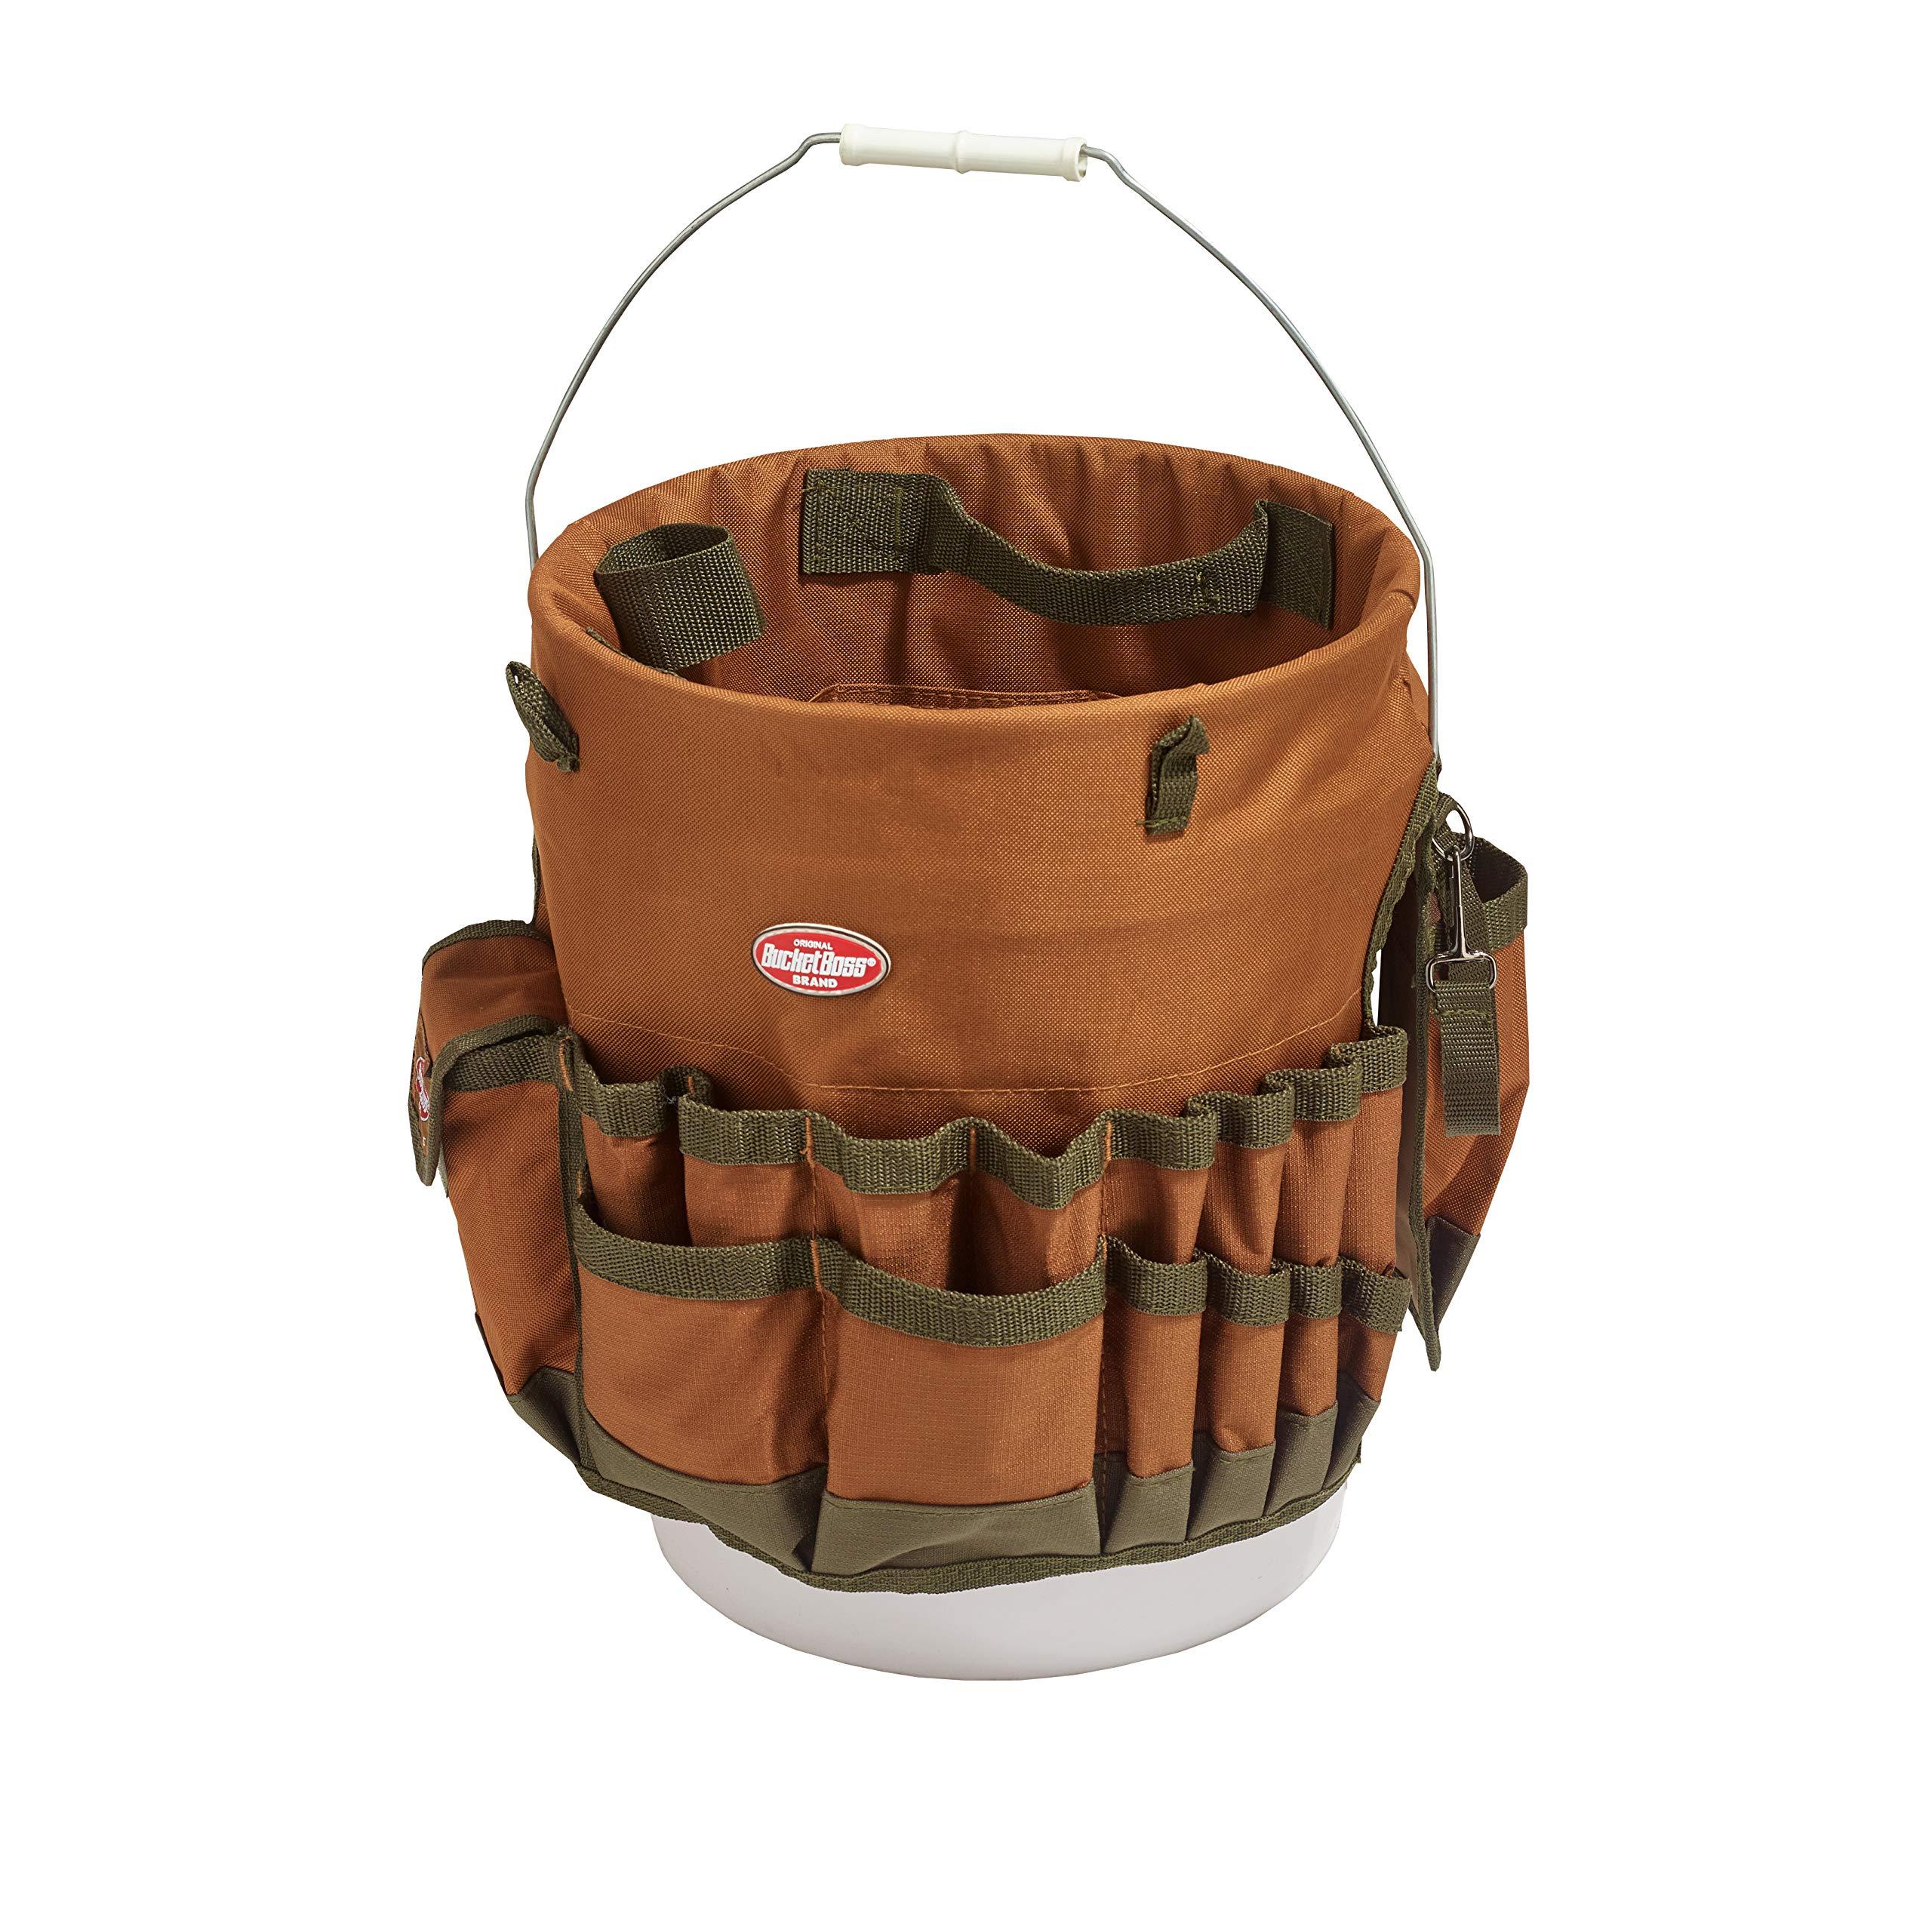 Bucket Boss The Bucketeer Bucket Tool Organizer in Brown, 10030 by Bucket Boss